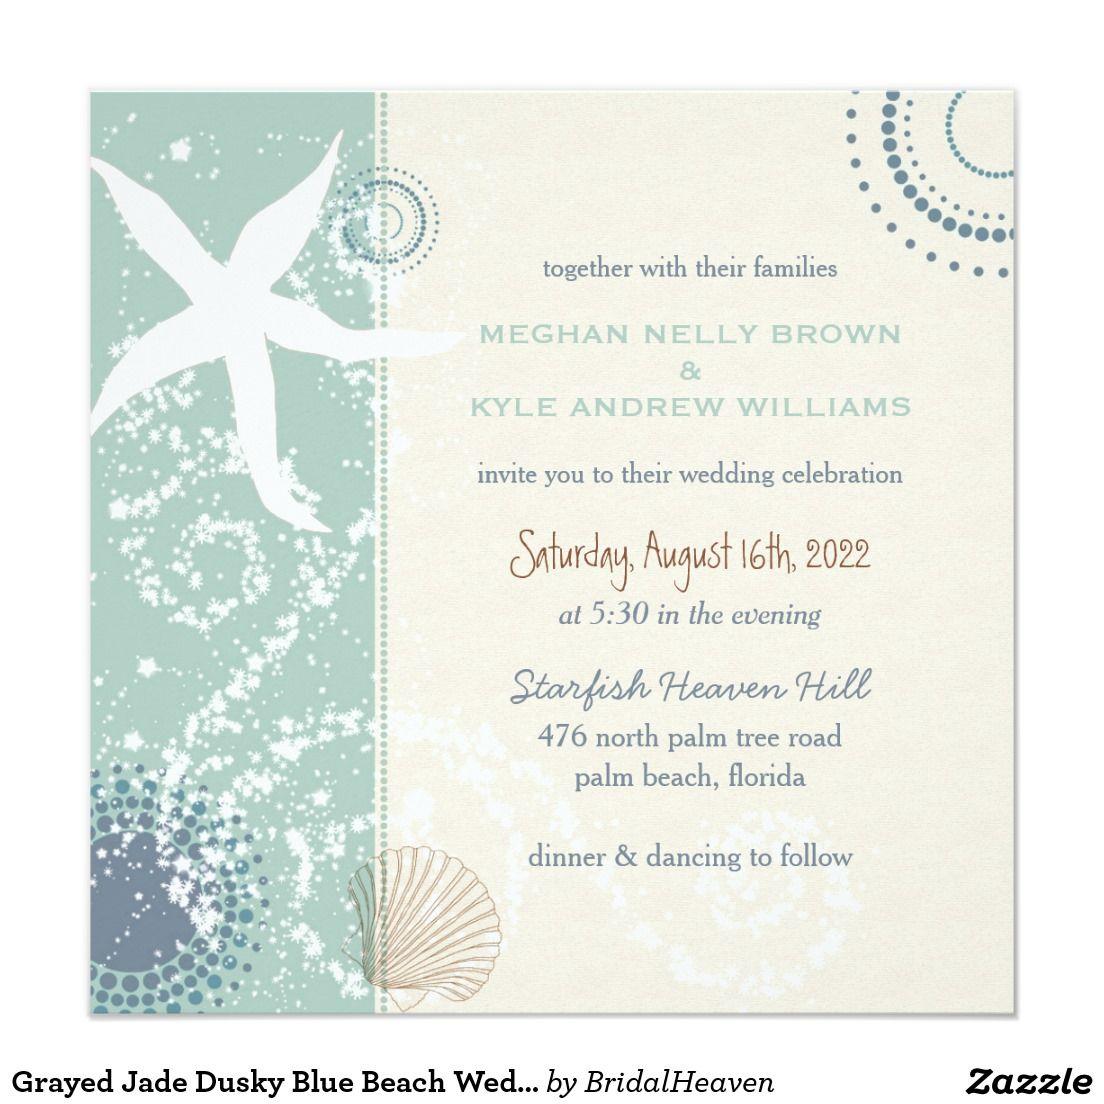 Casual Modern Beach Themed Wedding Invitation | Grayed Jade + Dusky ...